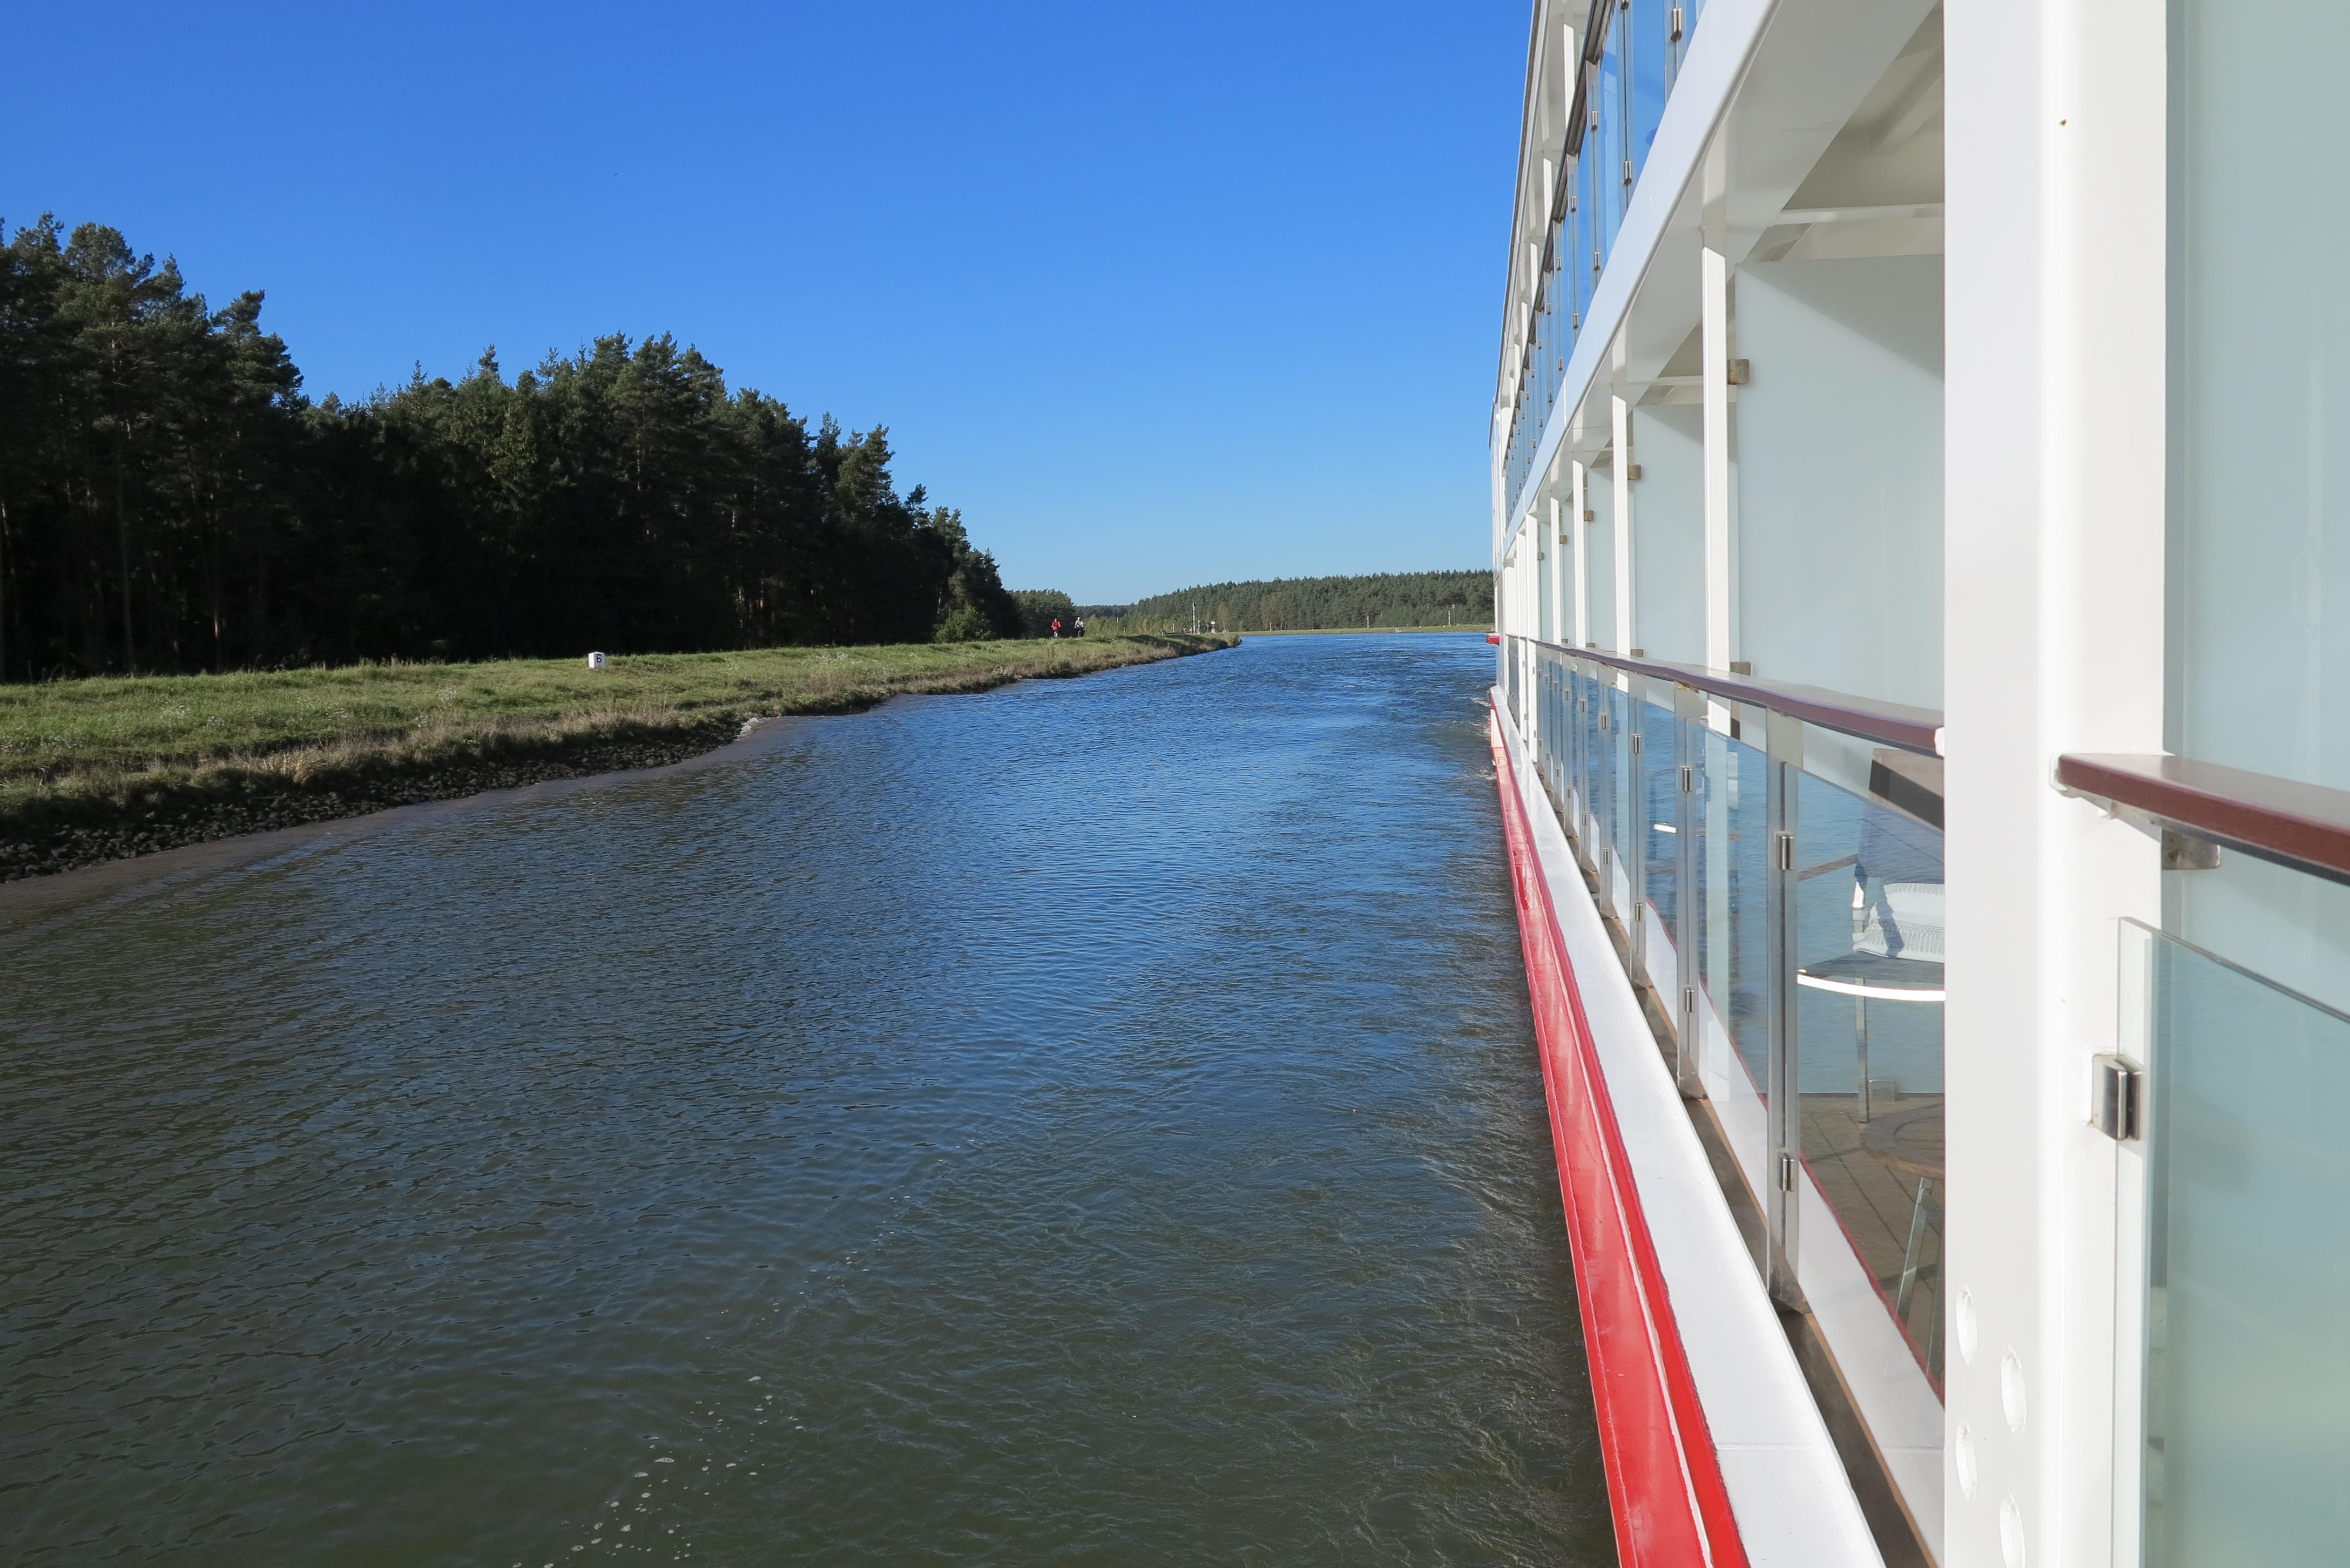 Blue Danube: Sailing along the Main-Danube canal